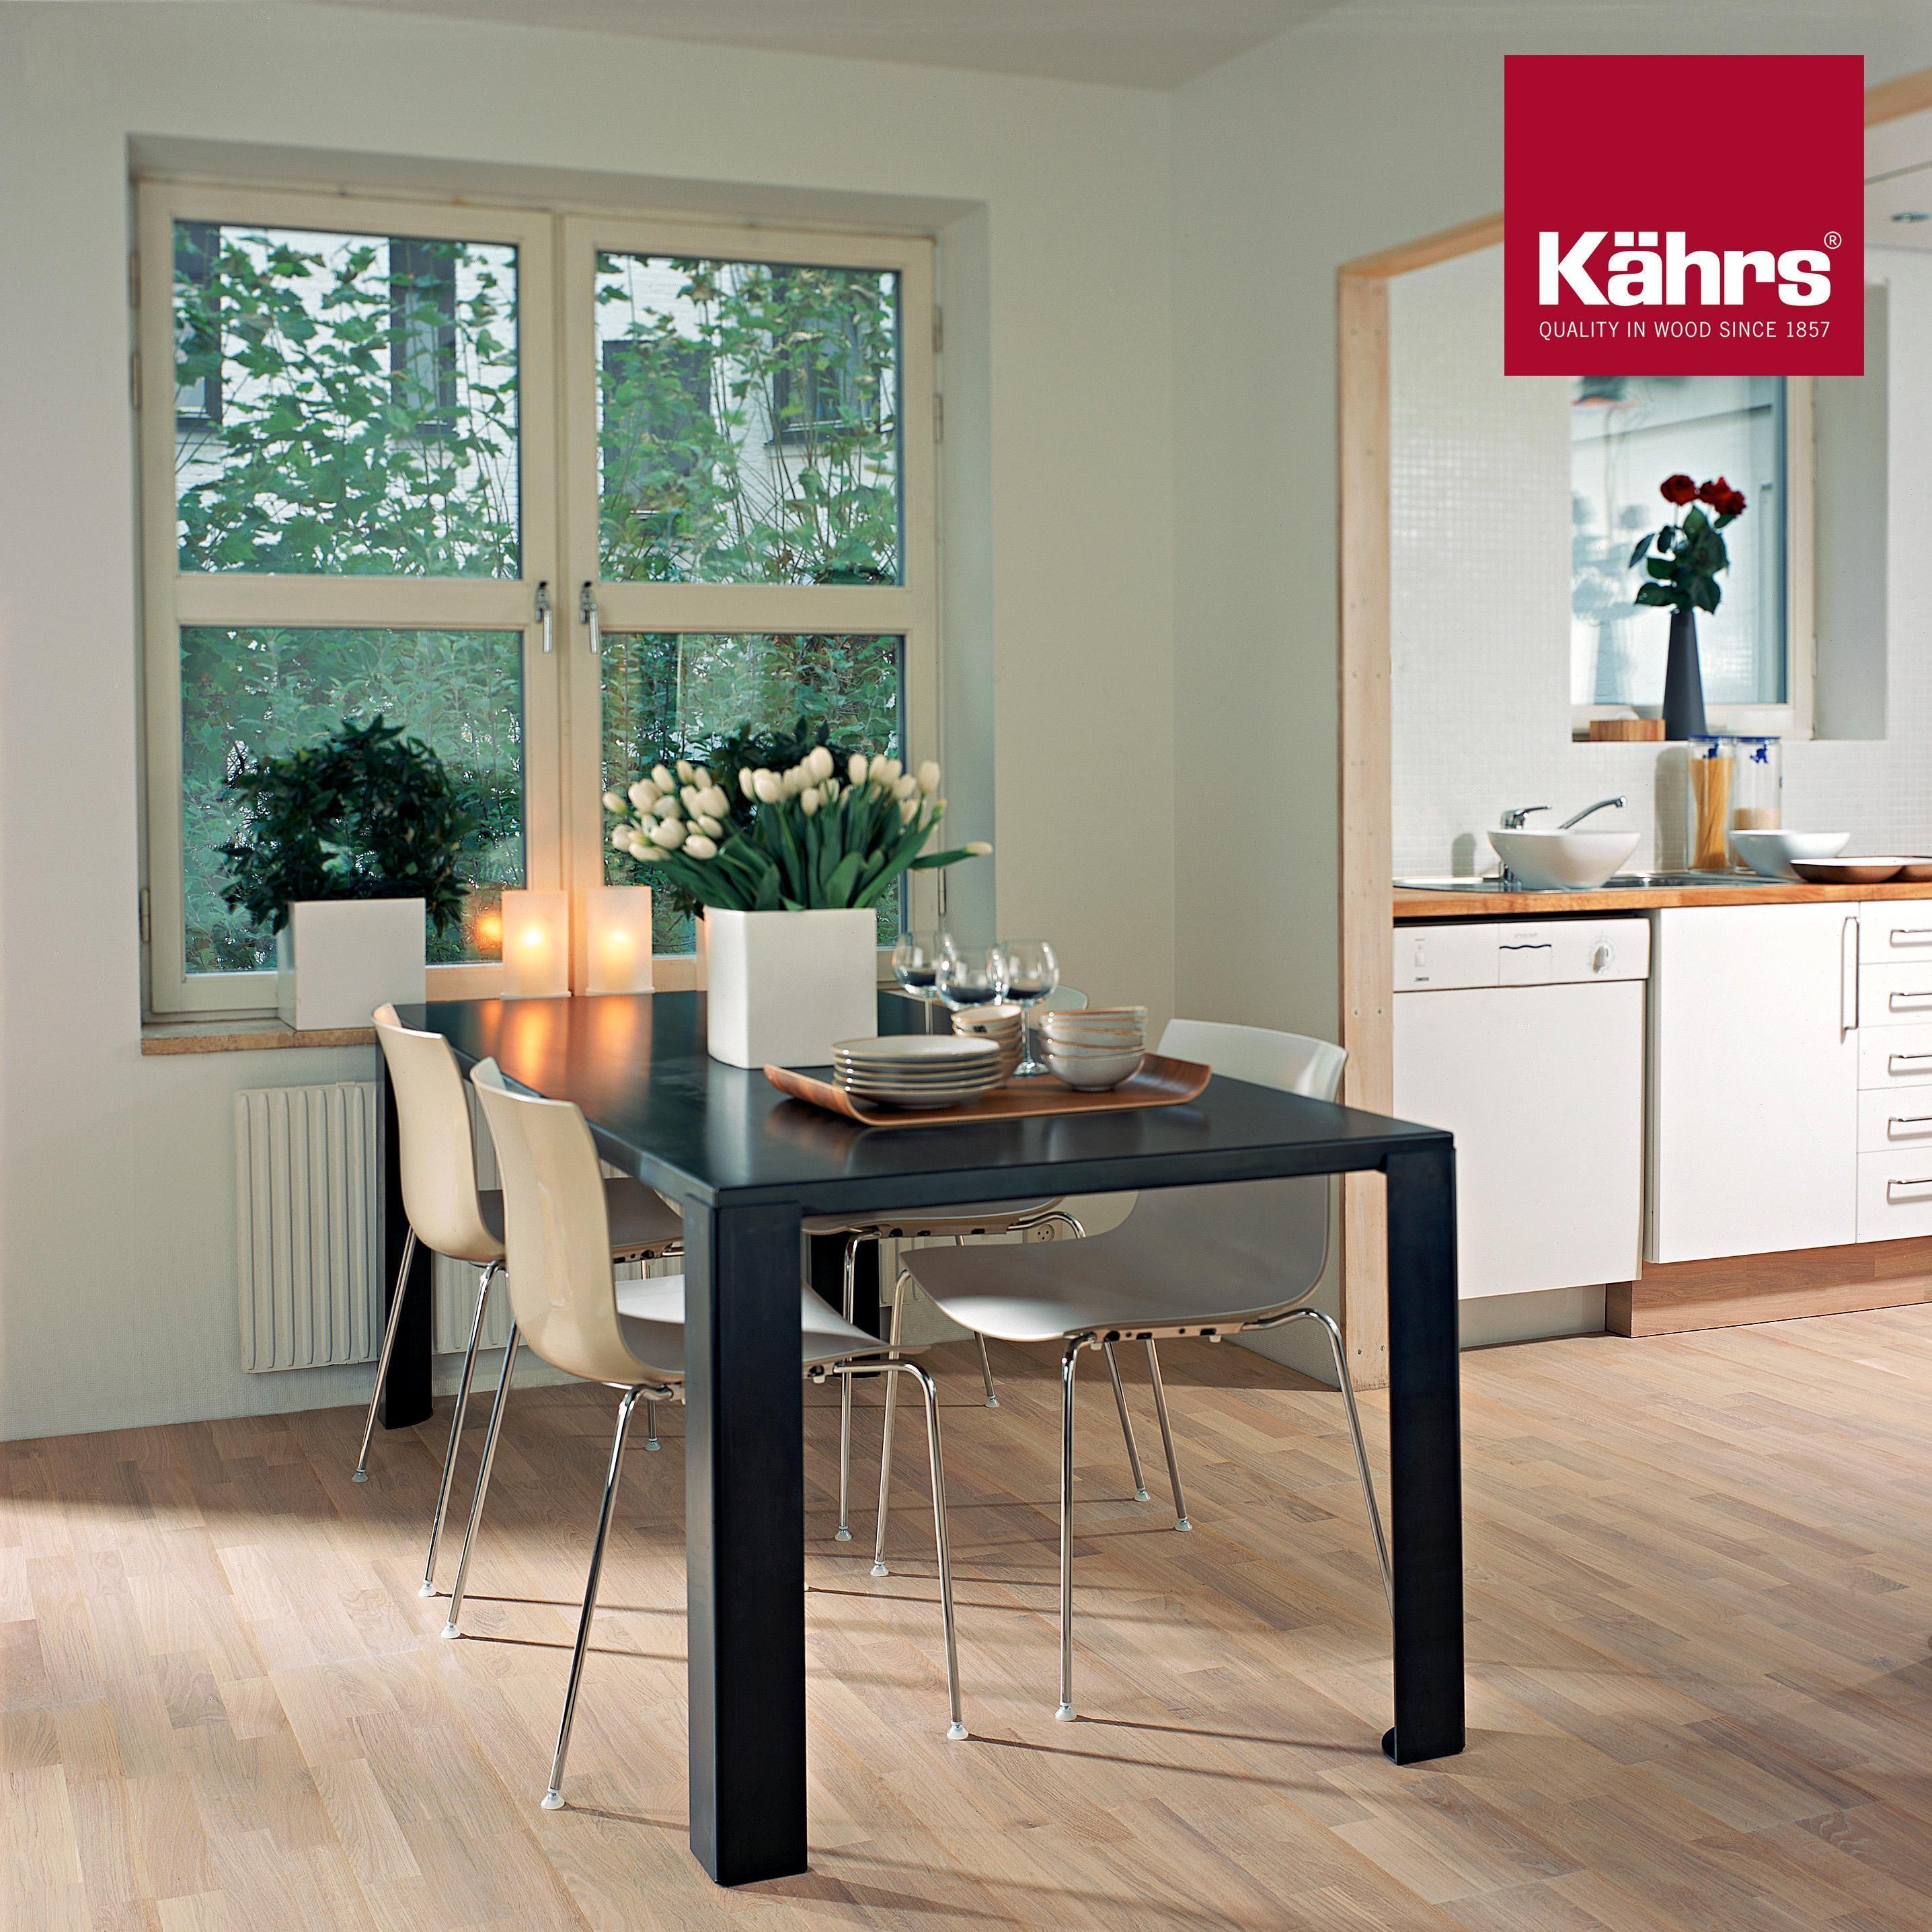 avanti schiffsboden collection avanti k hrs parkett bodenbel ge koncepta bodenwelten. Black Bedroom Furniture Sets. Home Design Ideas